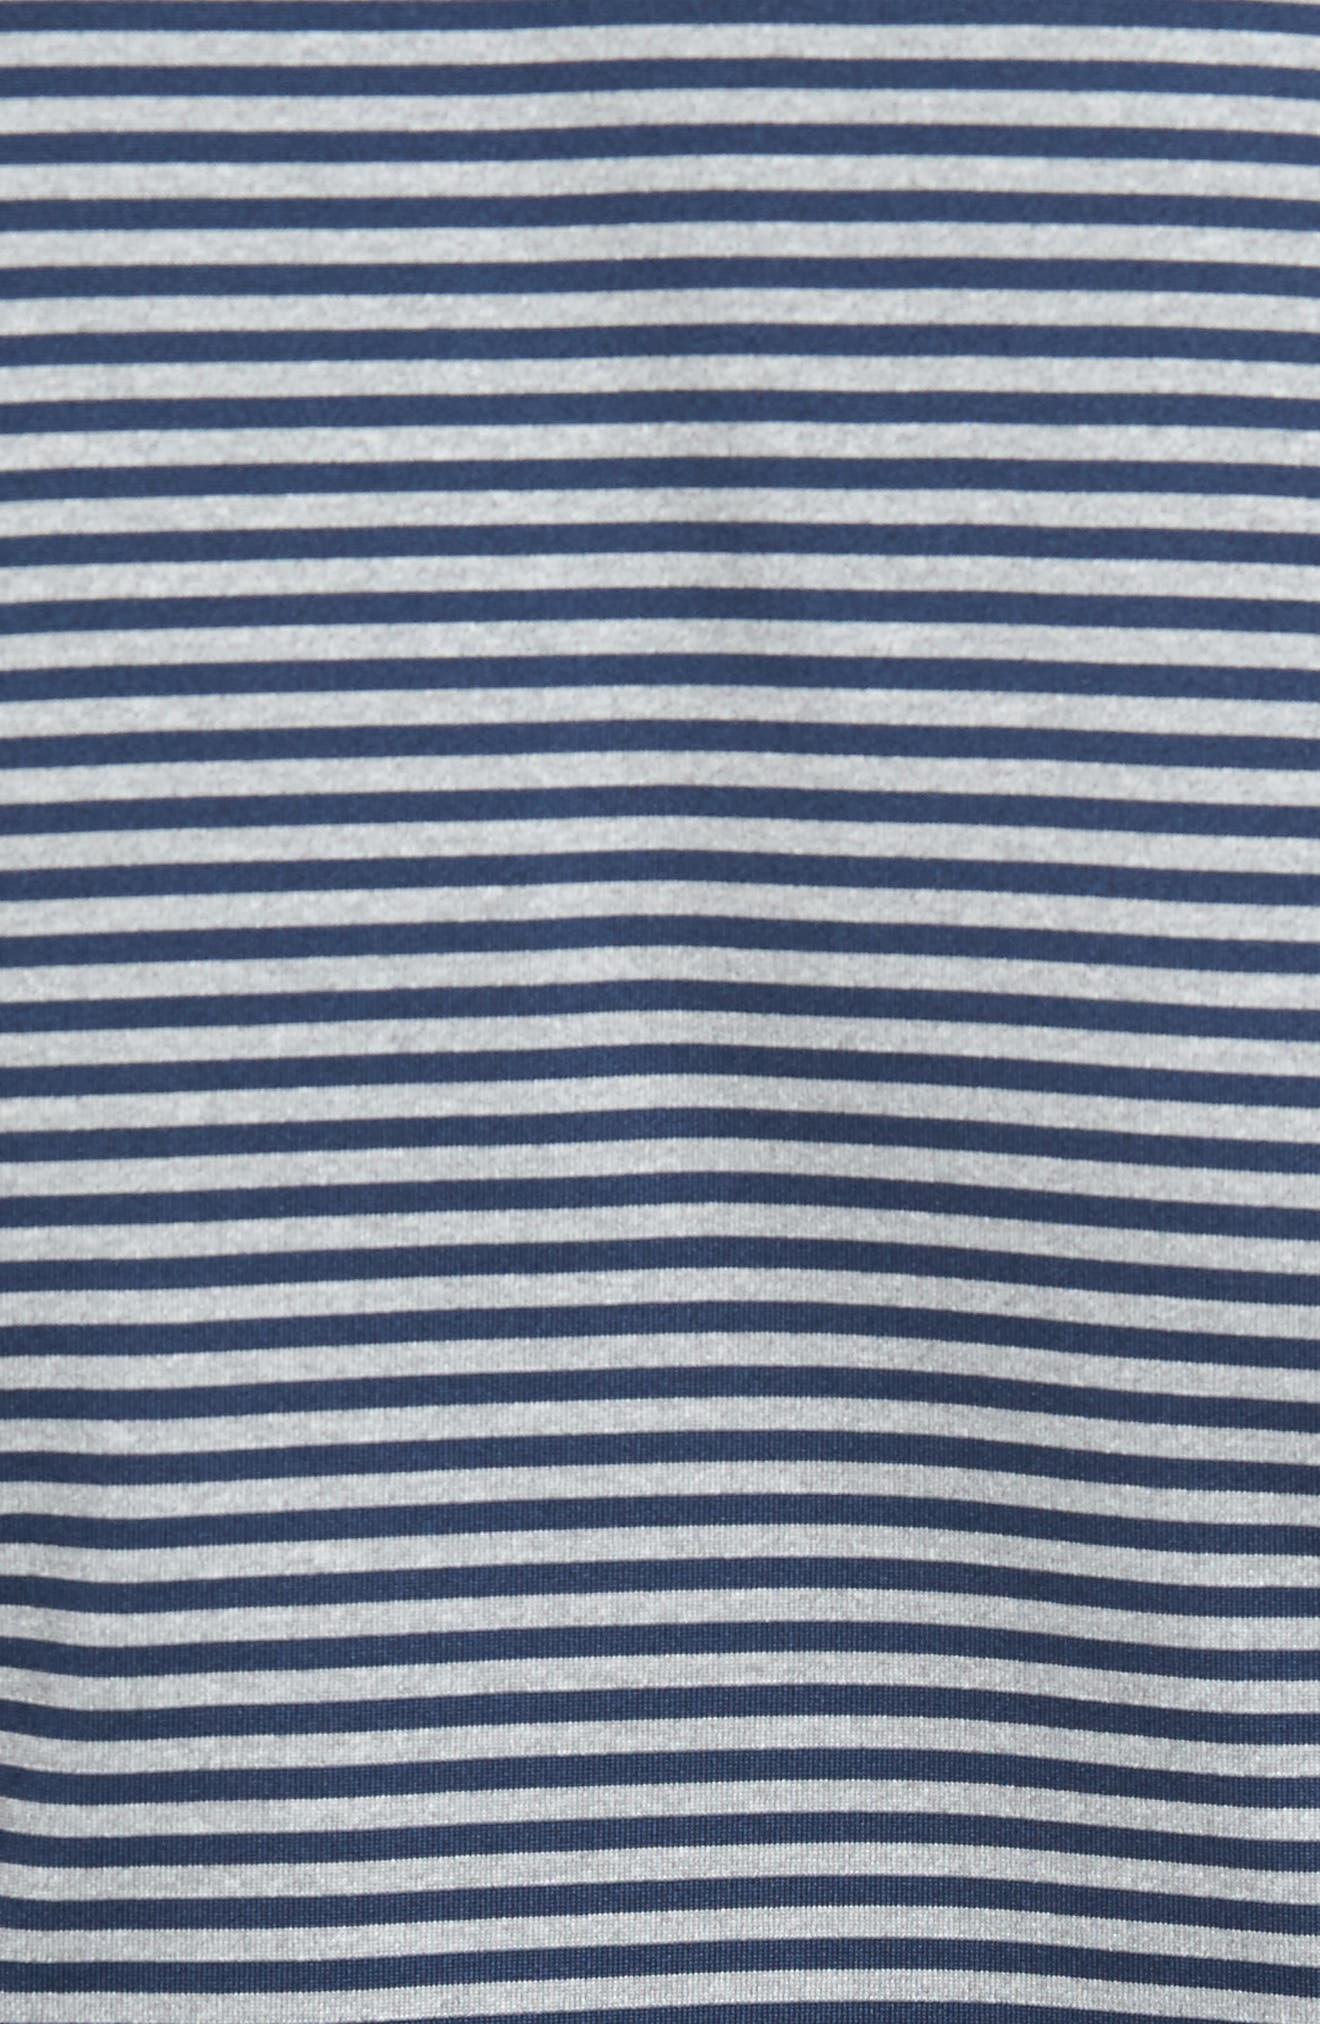 XH20 Ranger Stripe Polo,                             Alternate thumbnail 5, color,                             400